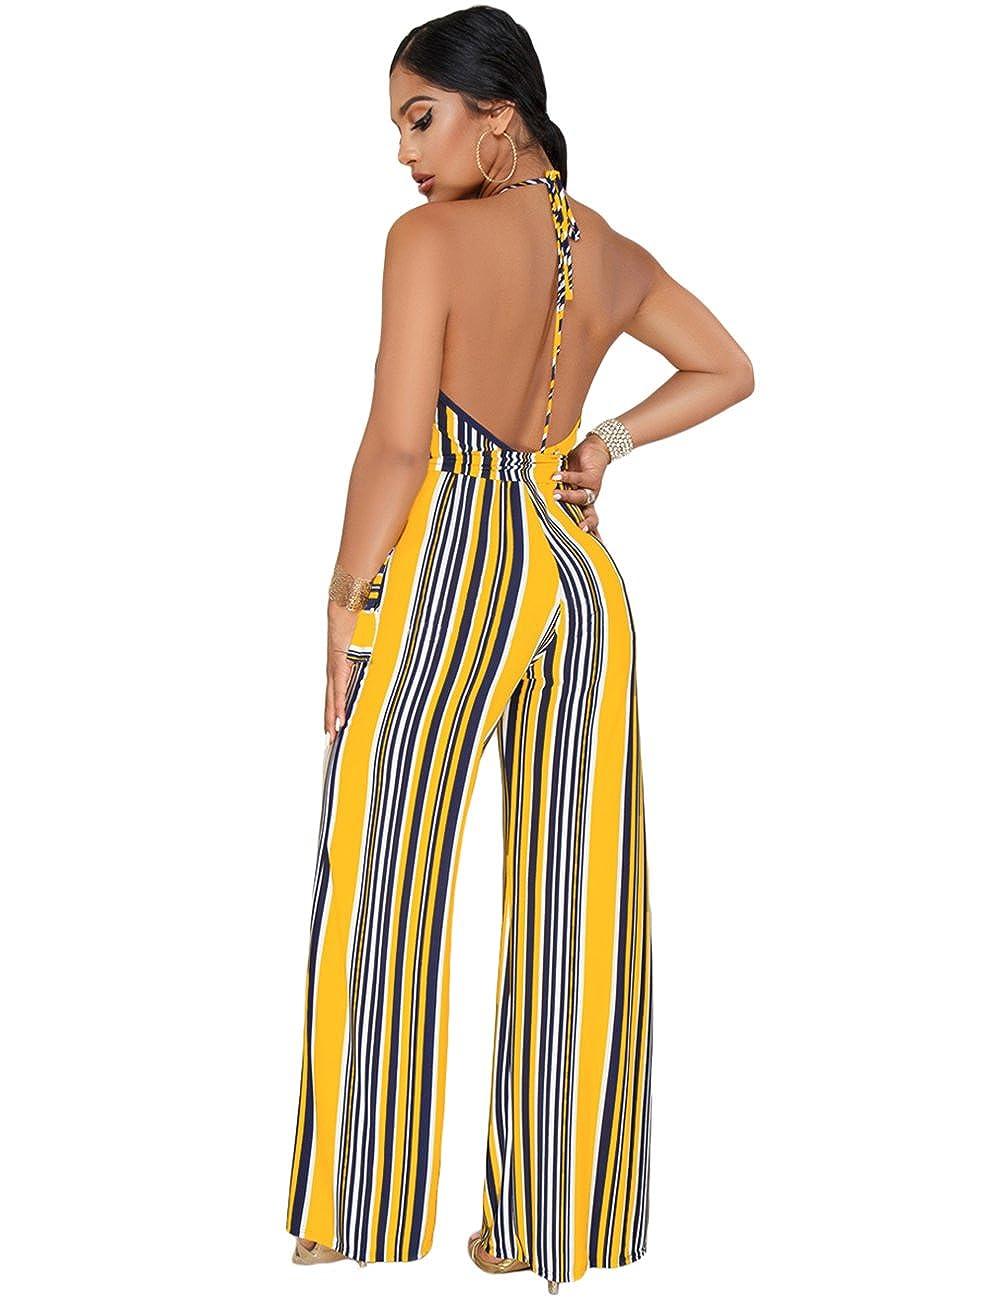 d2f6627102f Amazon.com  Women Striped Halter Deep V Neck Jumpsuit Romper Wide Leg  Backless Playsuit  Clothing